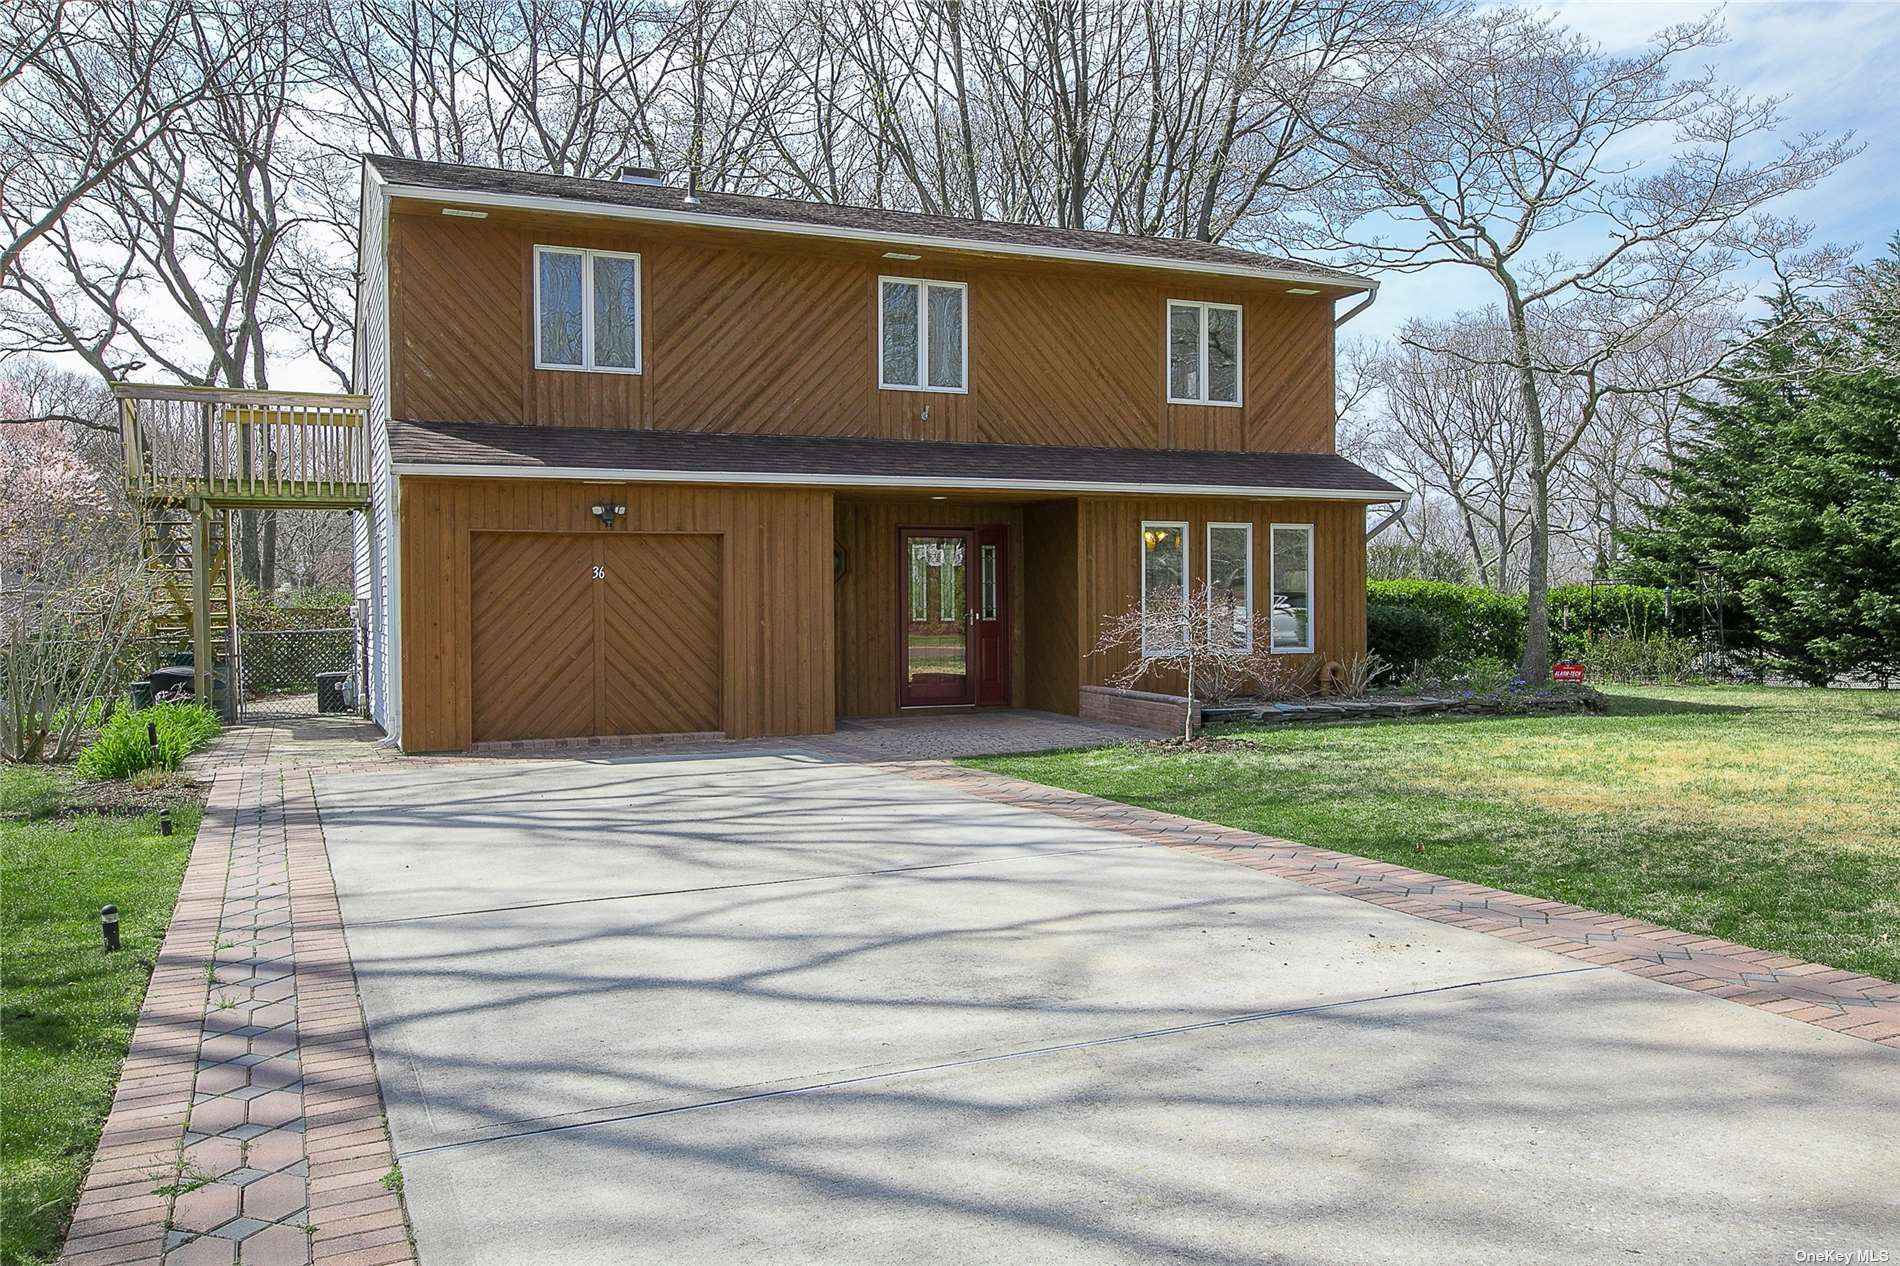 36 N. Morris Avenue, Farmingville, NY 11738 - MLS#: 3301801